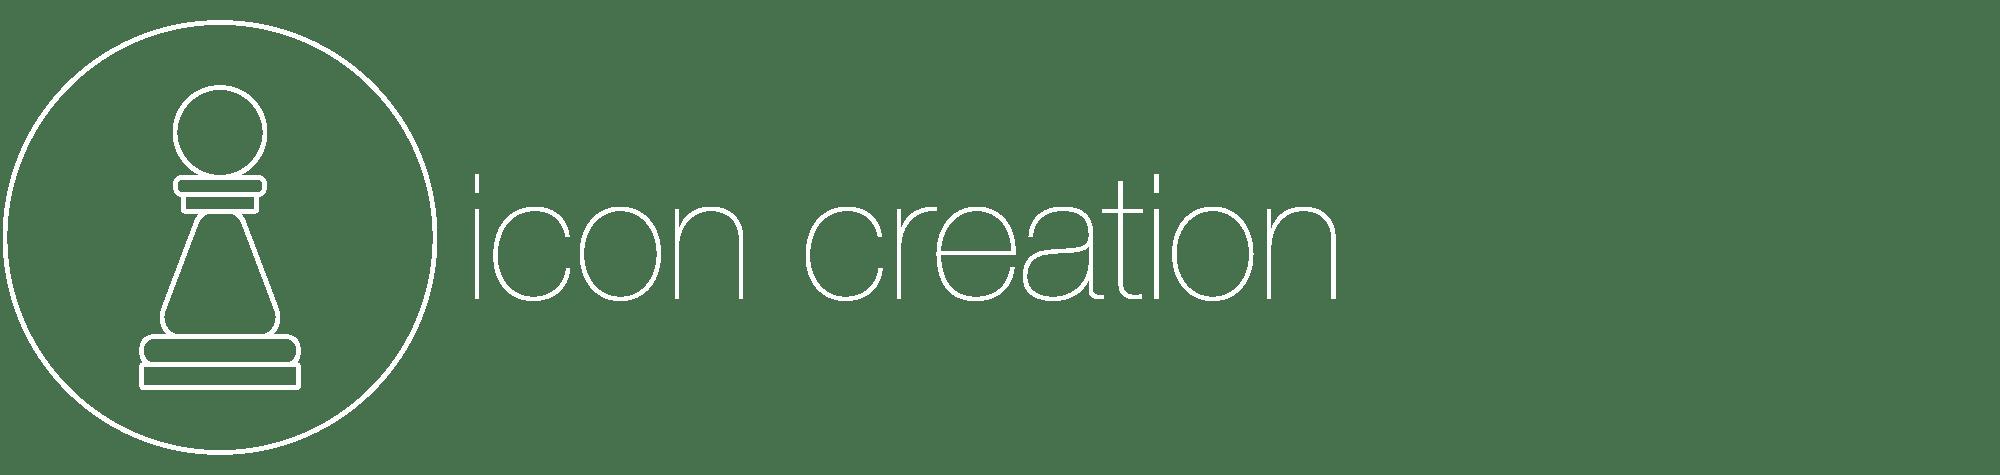 jason-b-graham-creative-services-icon-creation